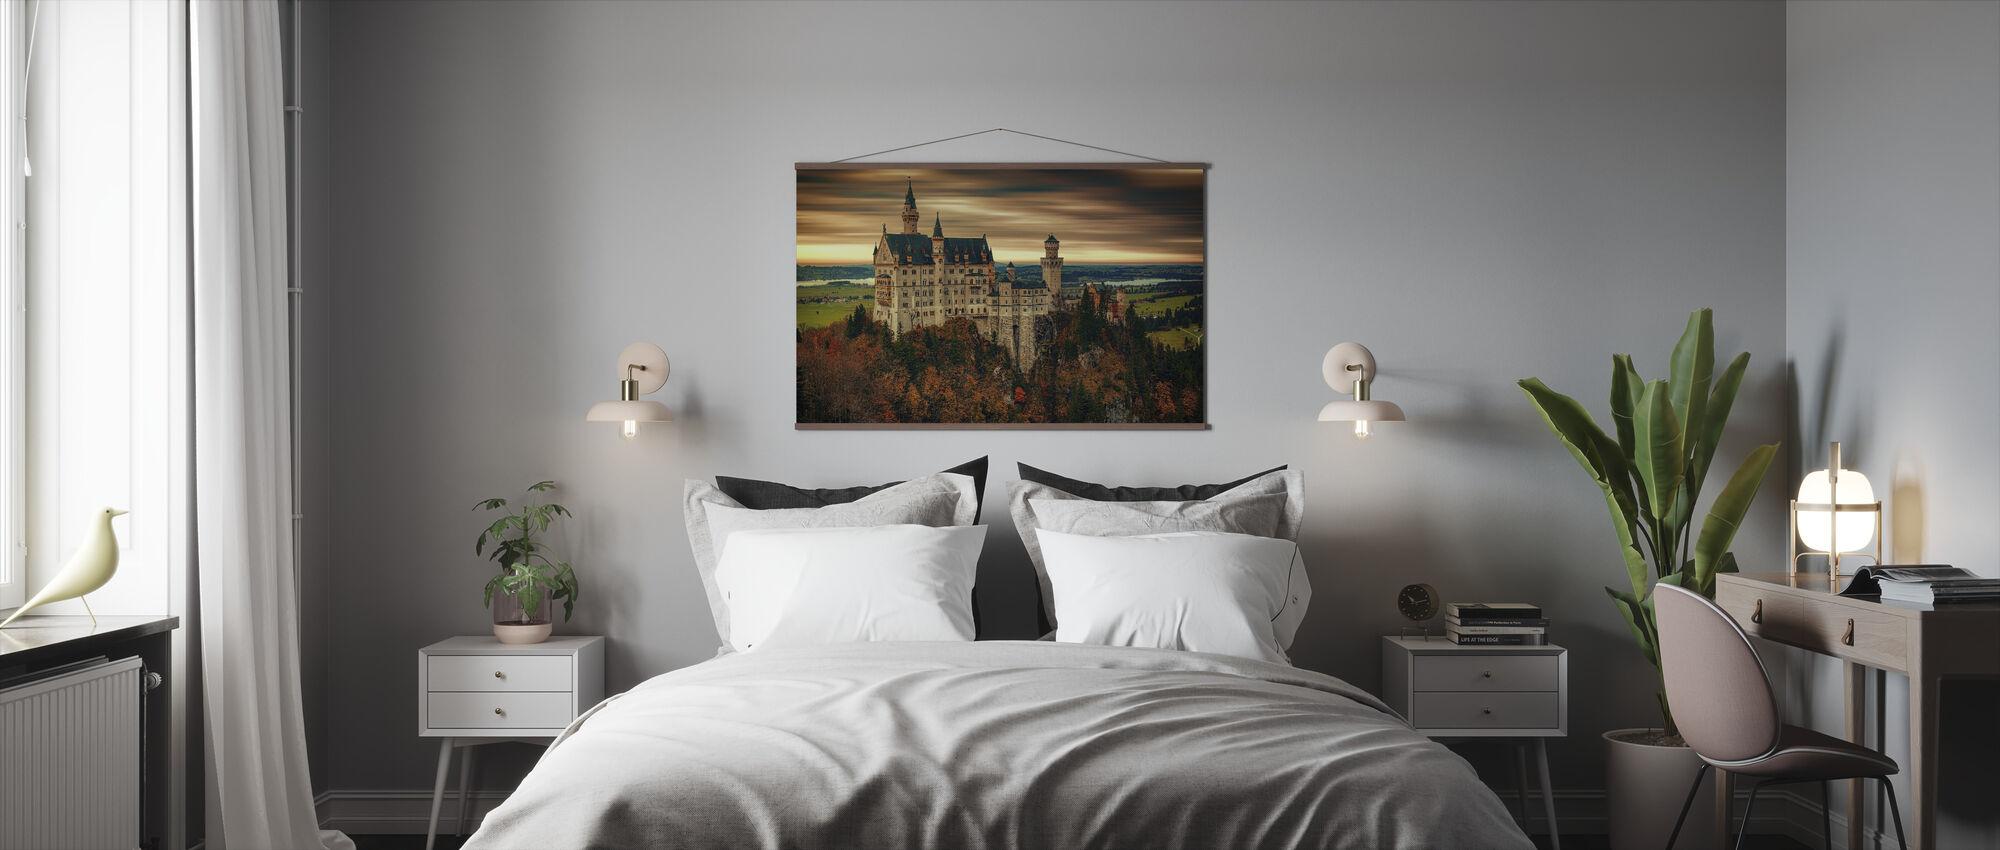 Castle - Poster - Bedroom